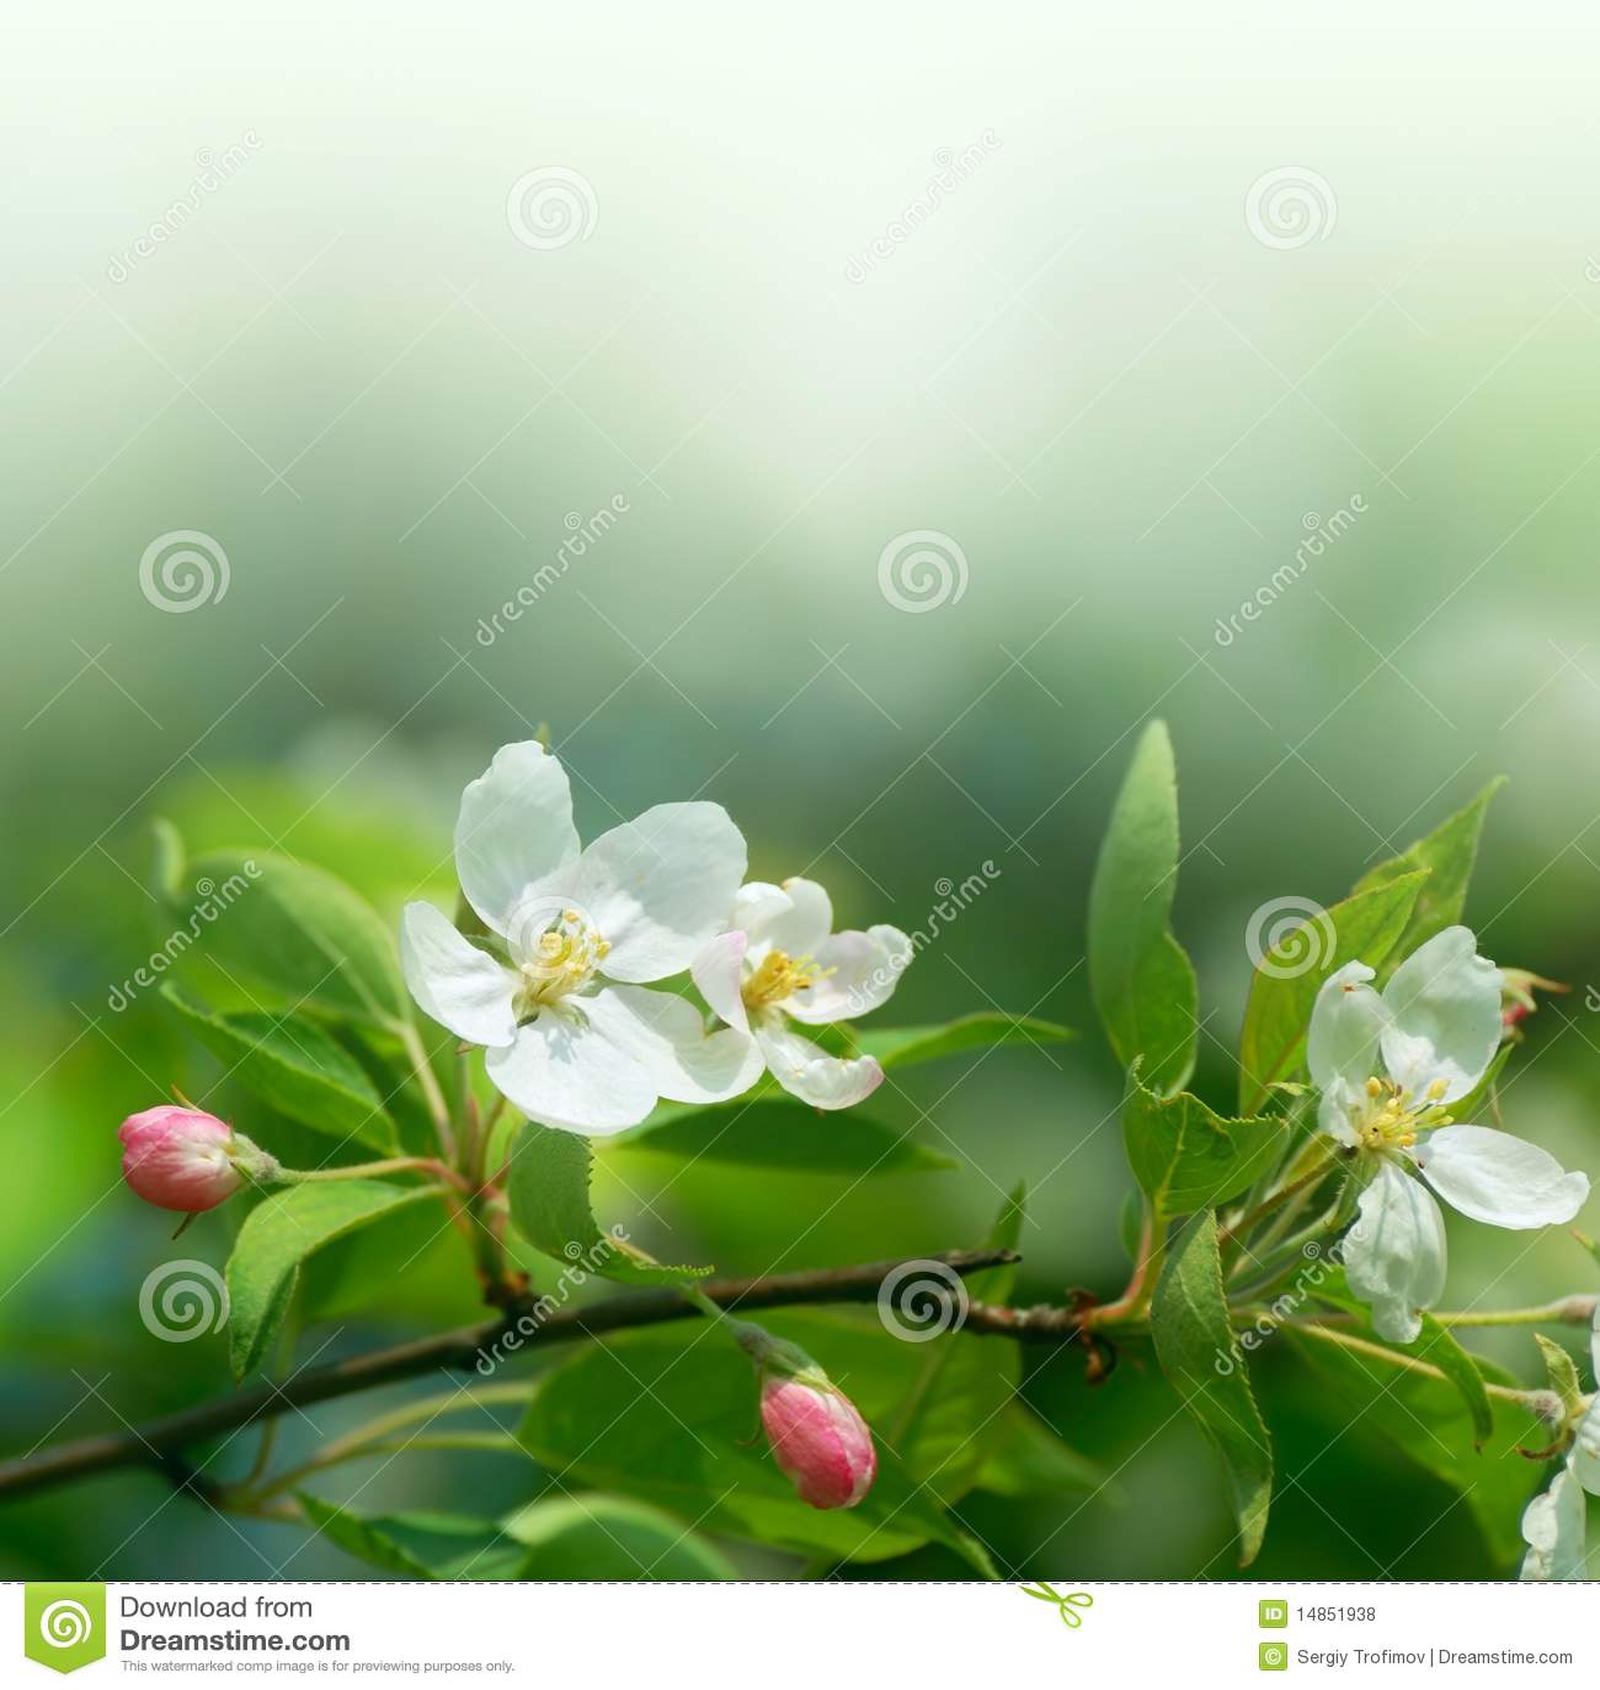 Cherry flowers in soft focus